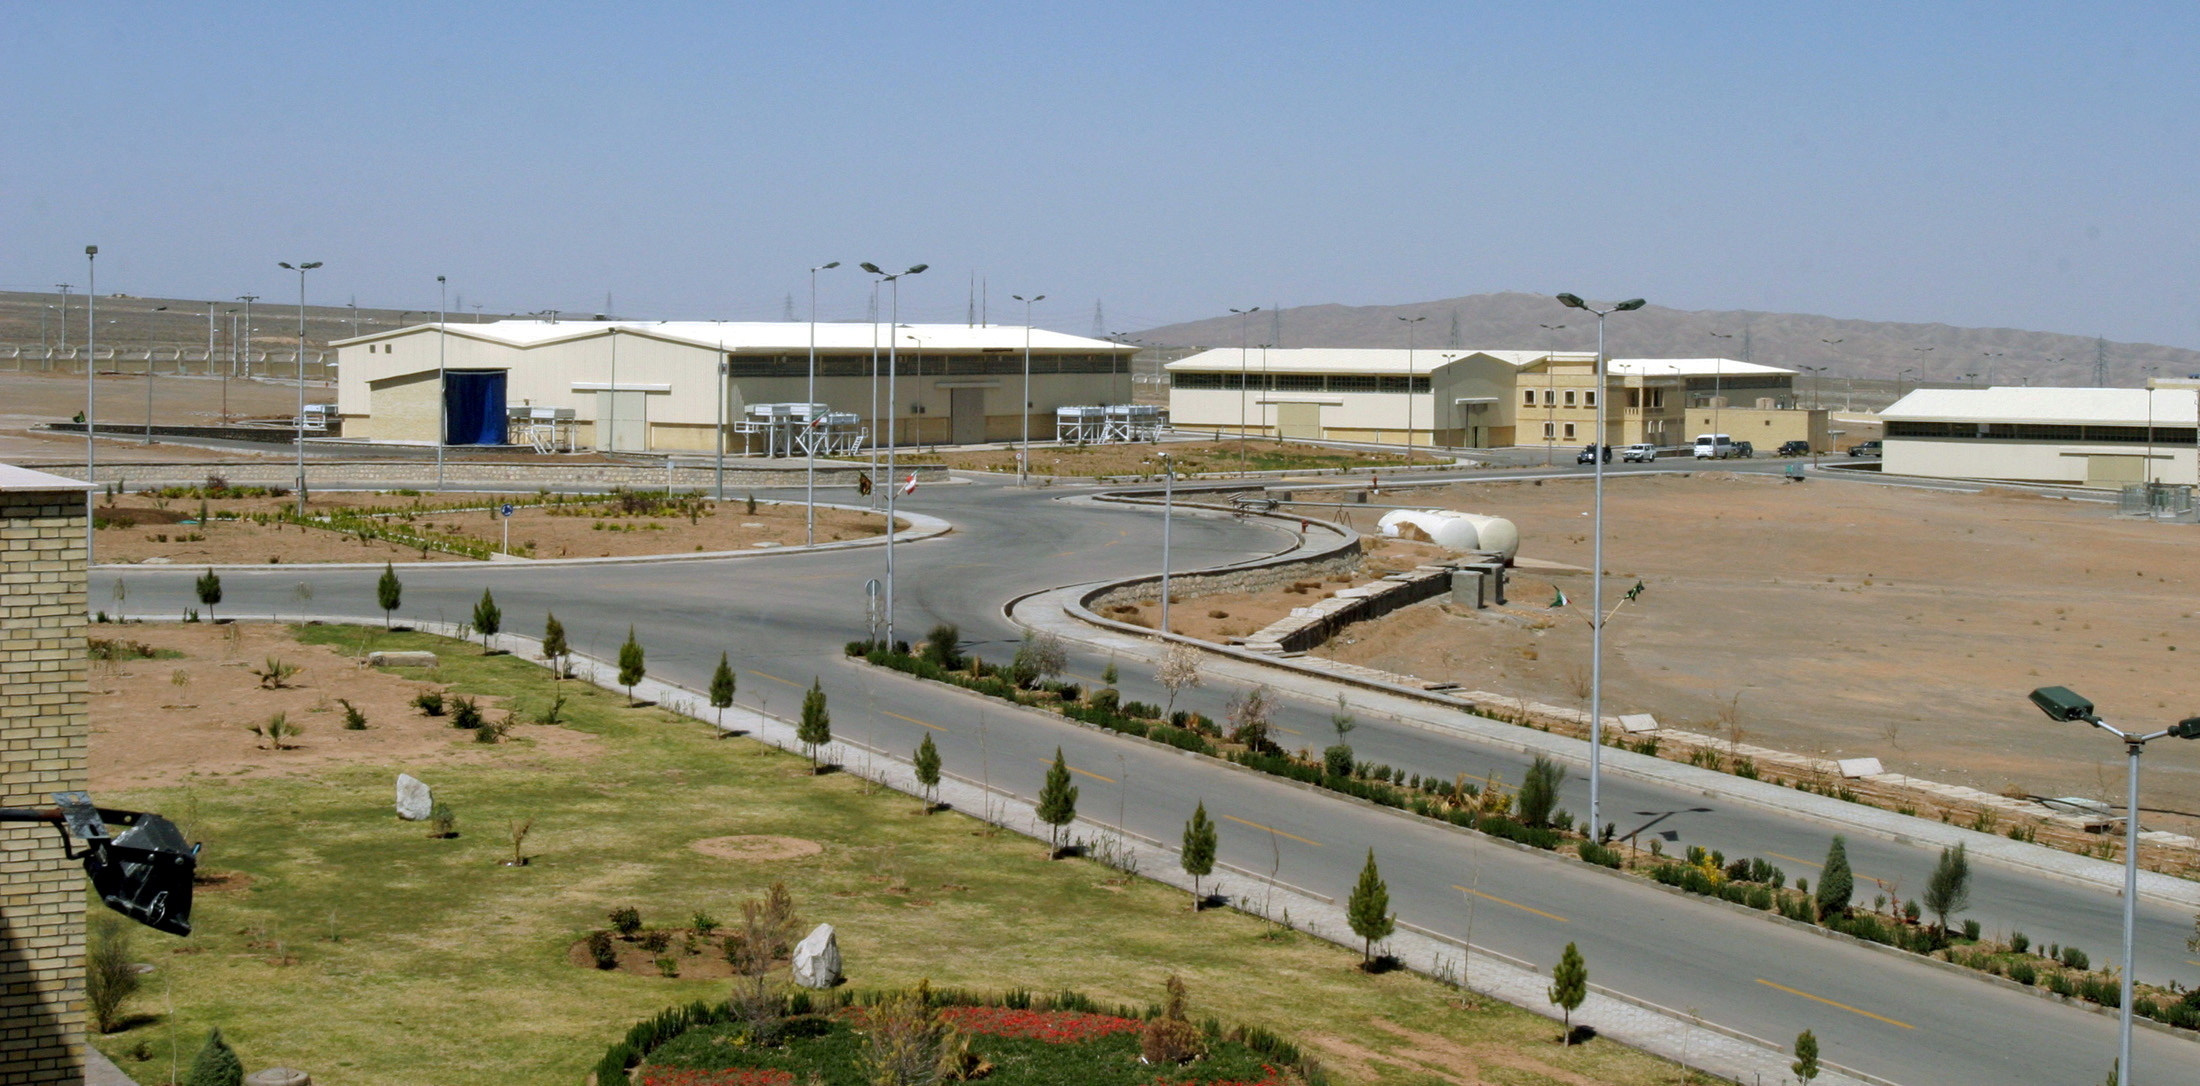 A view of the Natanz uranium enrichment facility 250 km (155 miles) south of the Iranian capital Tehran, March 30, 2005. REUTERS/Raheb Homavandi